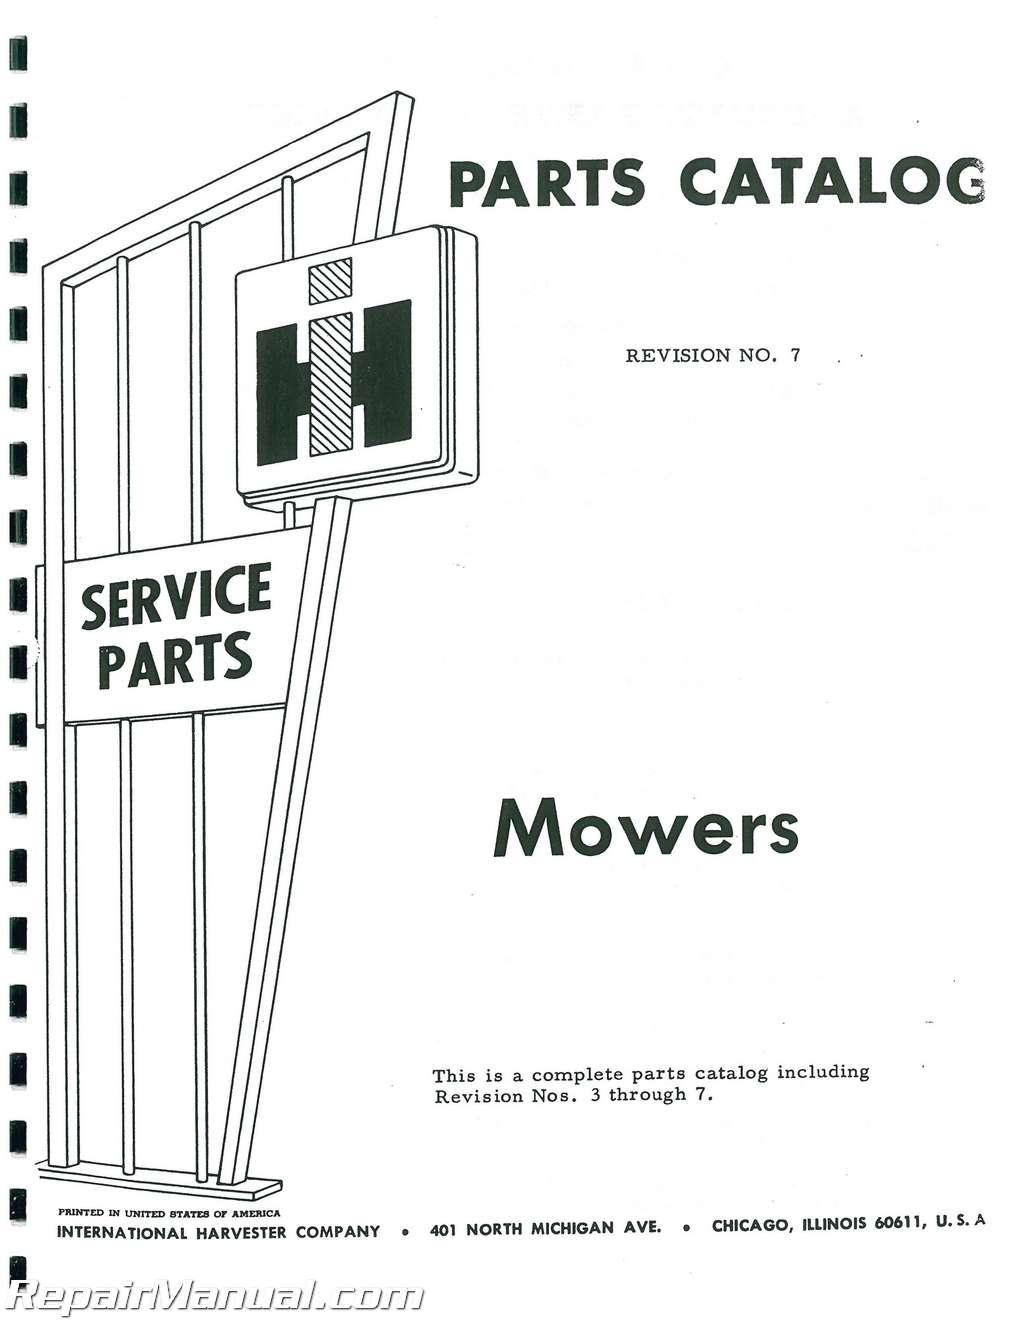 International Harvester 115 Balanced Head Mower Parts Manual